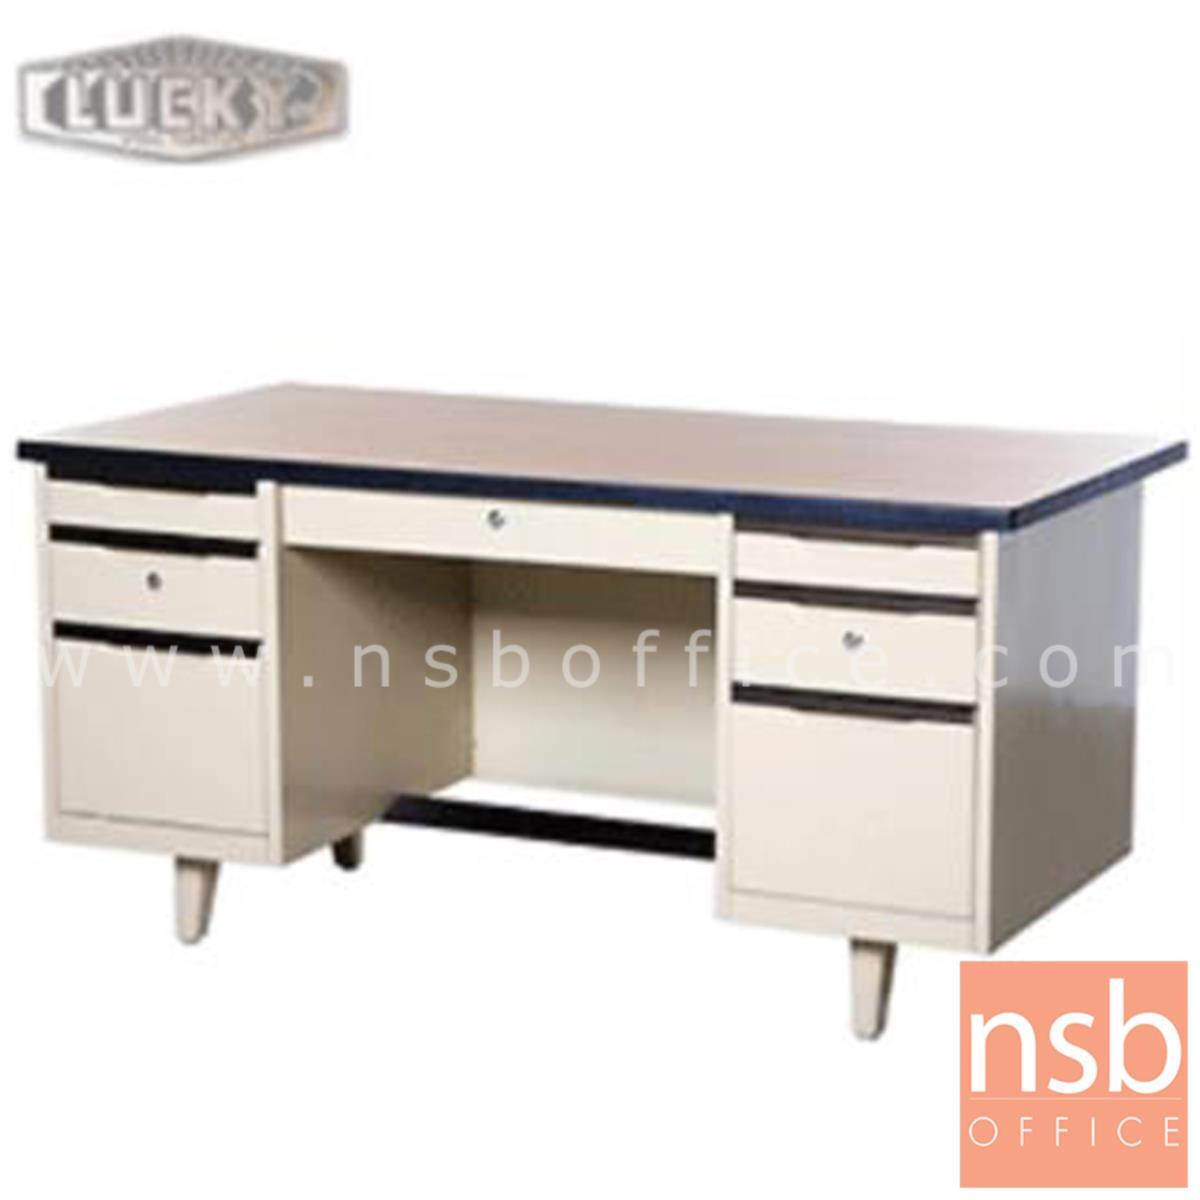 E28A026:โต๊ะทำงานเหล็ก 7 ลิ้นชัก ยี่ห้อลัคกี้  รุ่น NTC-2654,NTC-3060,NTC-3472 โฟเมก้าลายไม้